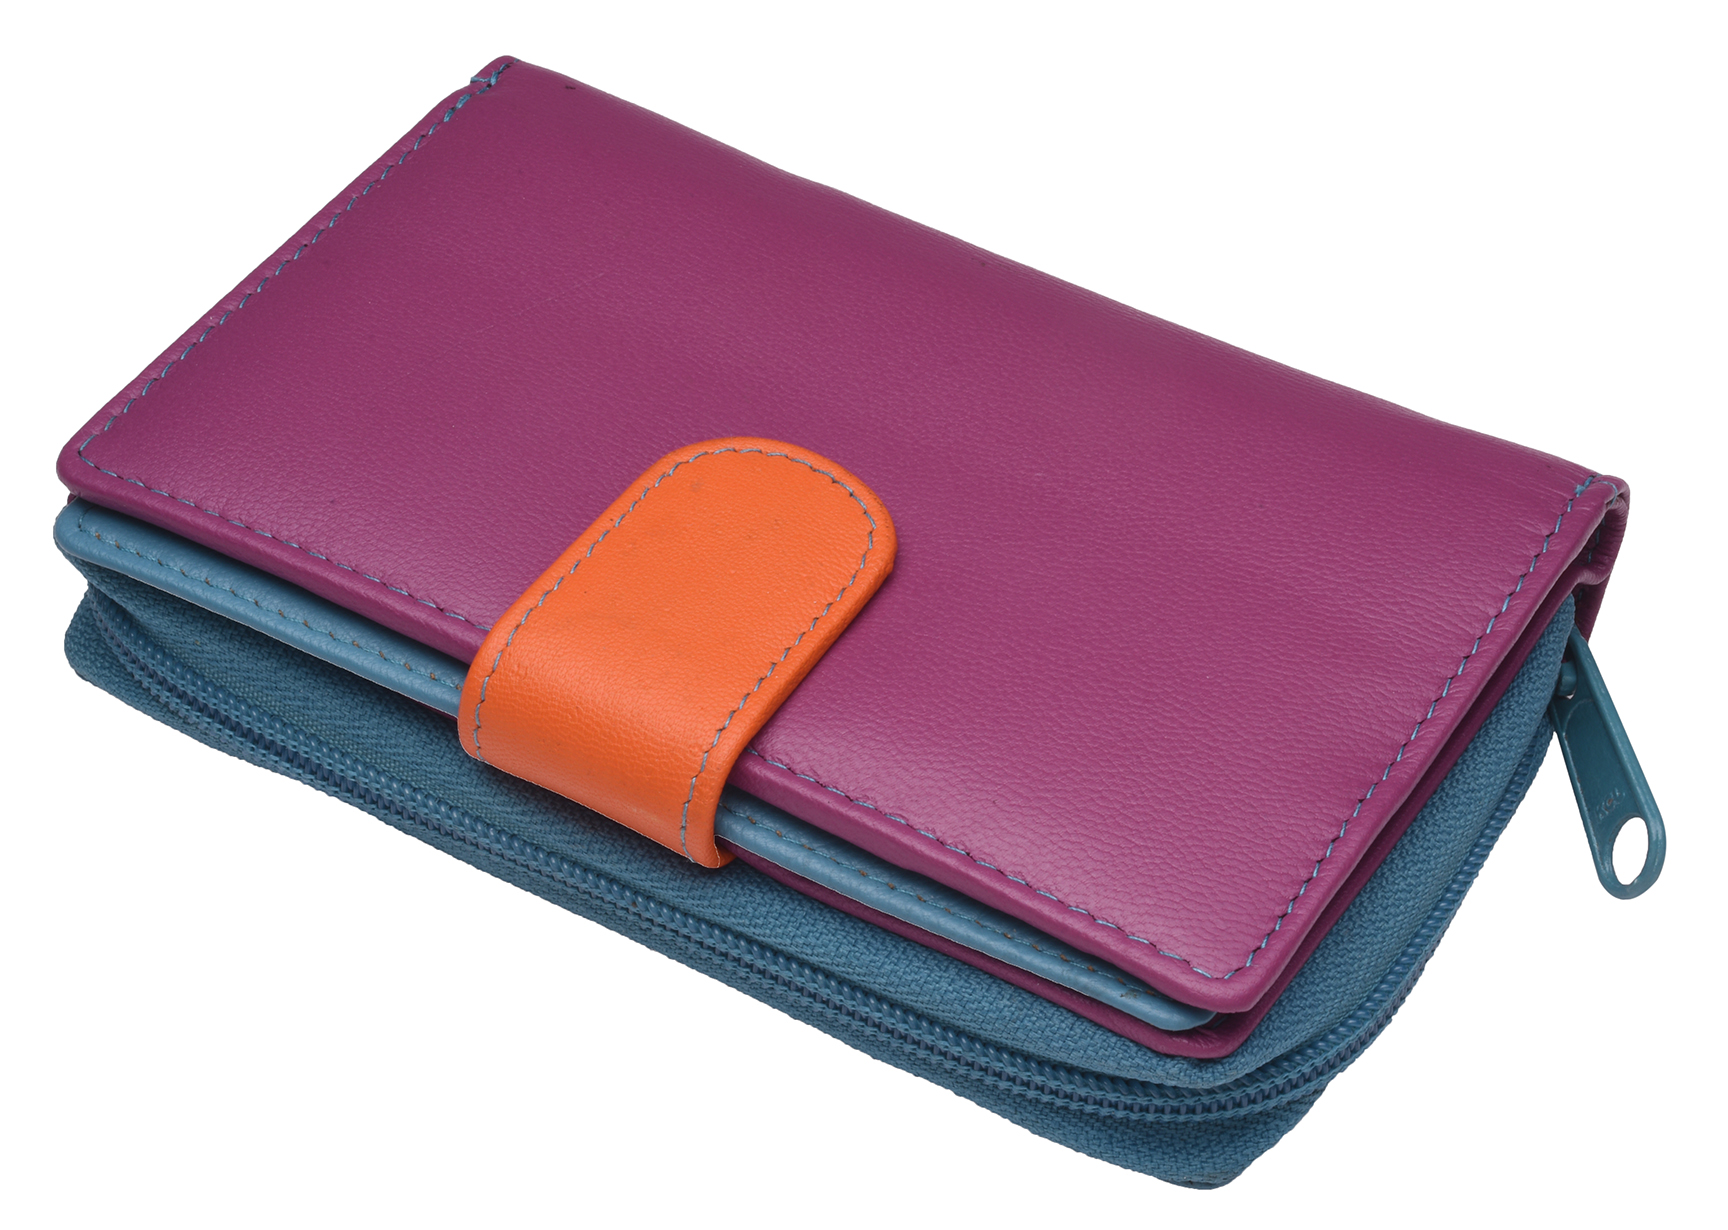 Ladies-Womens-RFID-Blocking-Safe-Leather-Bifold-Medium-Purse-Wallet-Coin-Section thumbnail 7